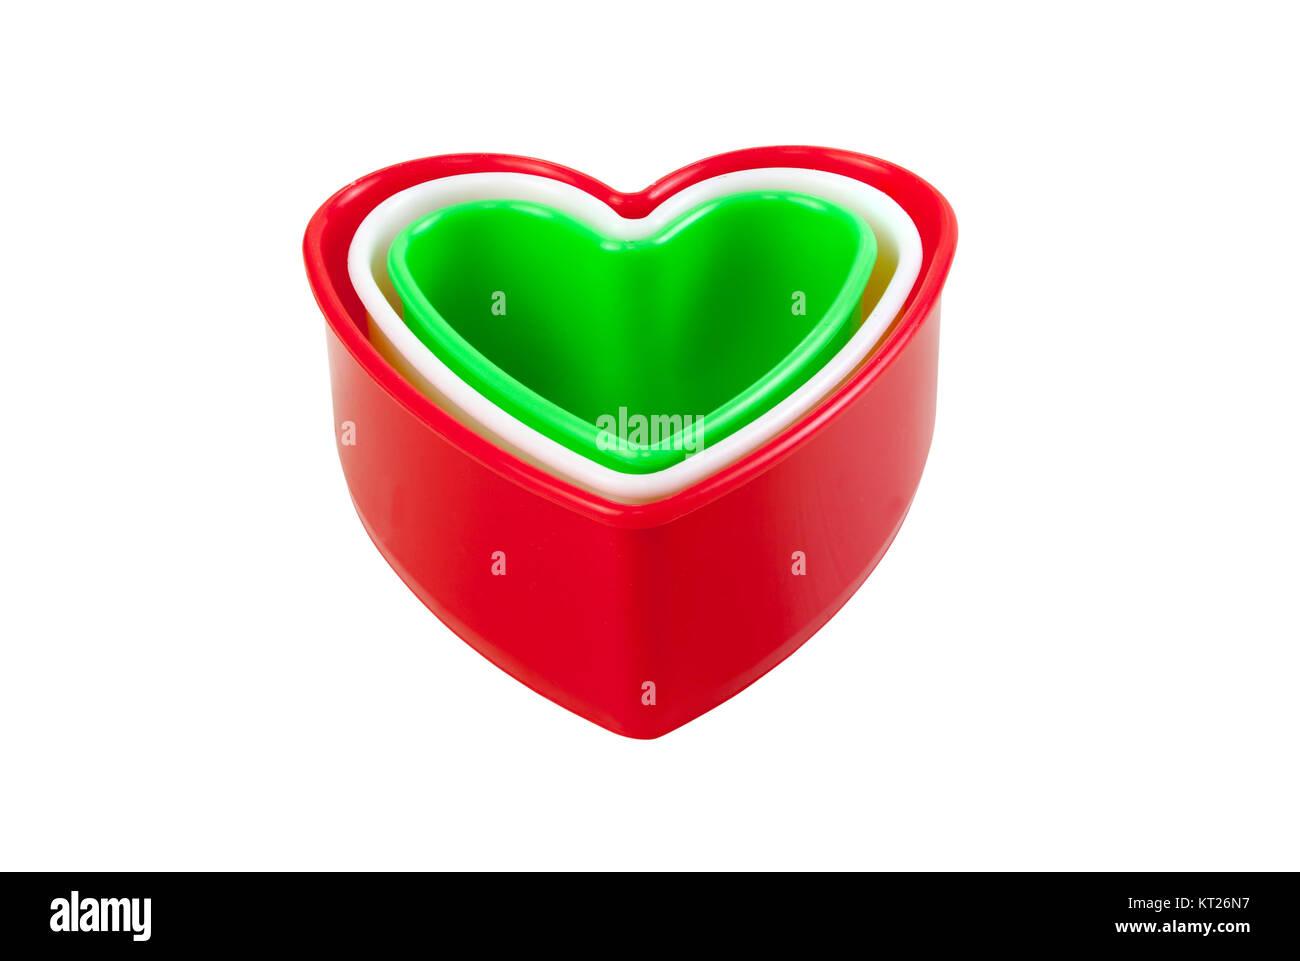 en plastique multicolores en forme de coeur isol banque d 39 images photo stock 169694259 alamy. Black Bedroom Furniture Sets. Home Design Ideas